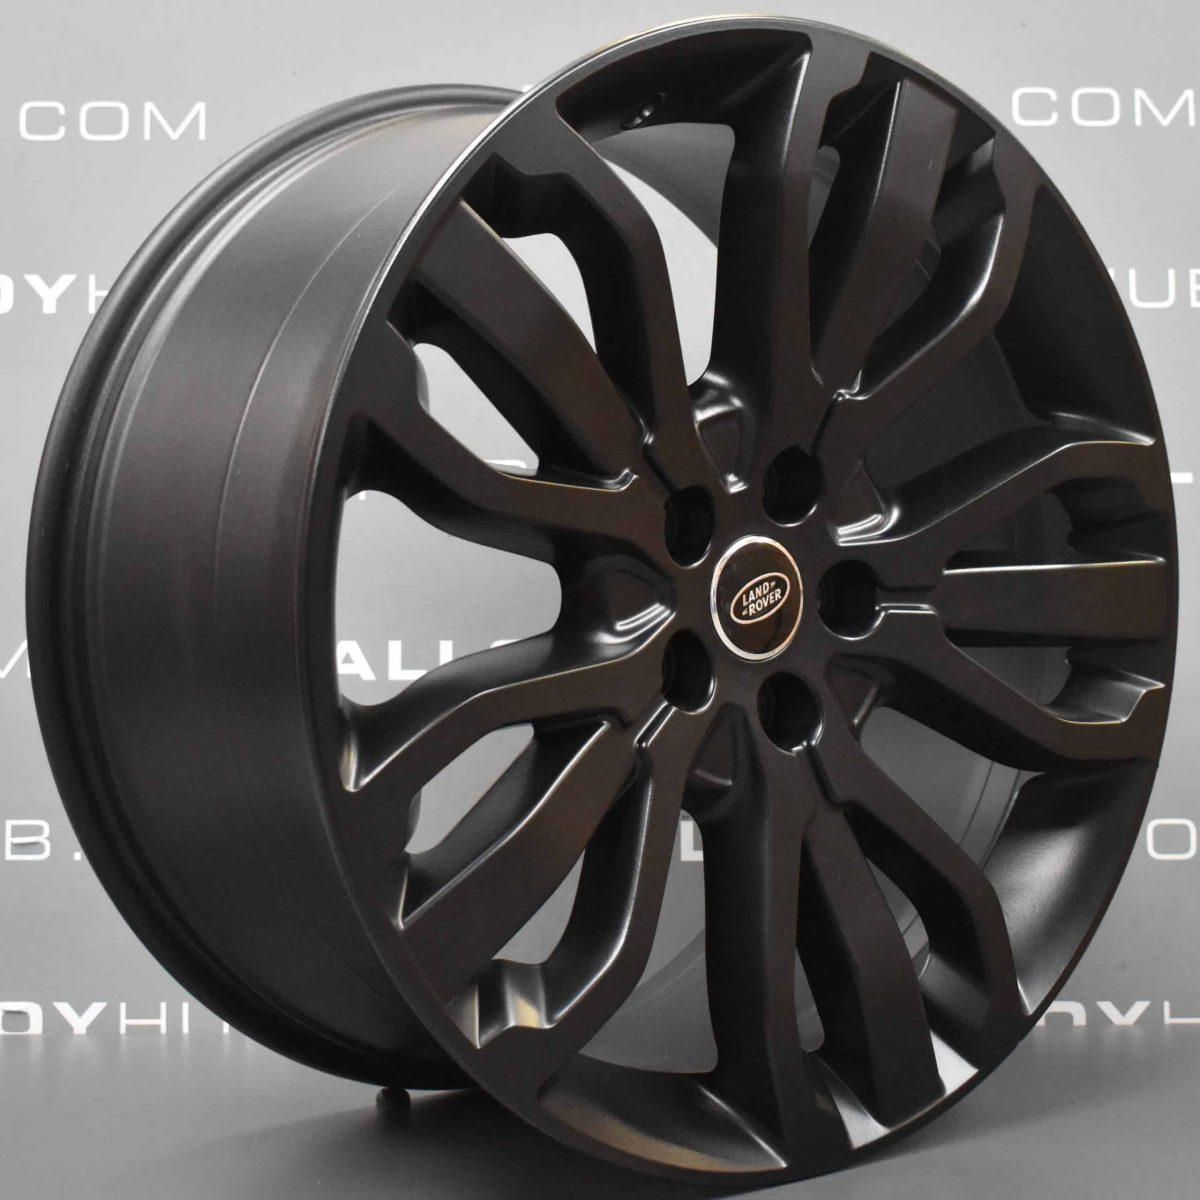 "Genuine Land Rover Range Rover Style 5007 21"" inch 5 Split-Spoke Satin Black Forged Alloy Wheels VPLWW0091"